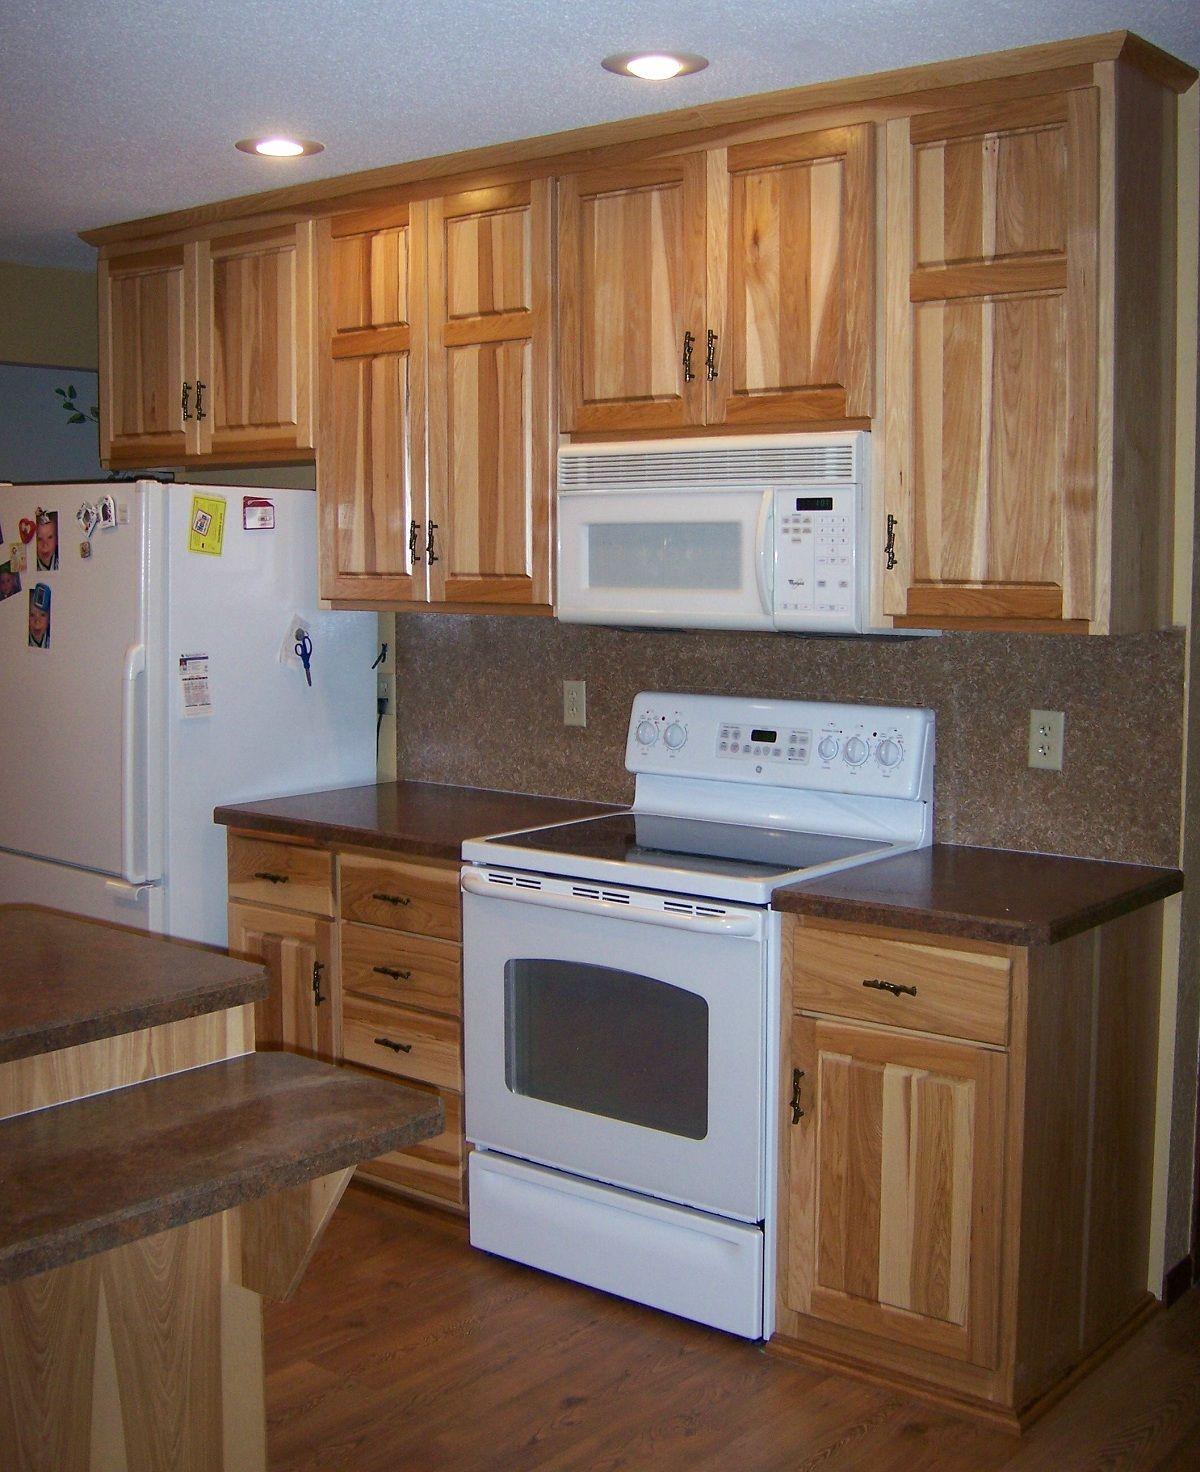 Custom Kitchen Cabinet Designs: Hickory Kitchen Cabinets